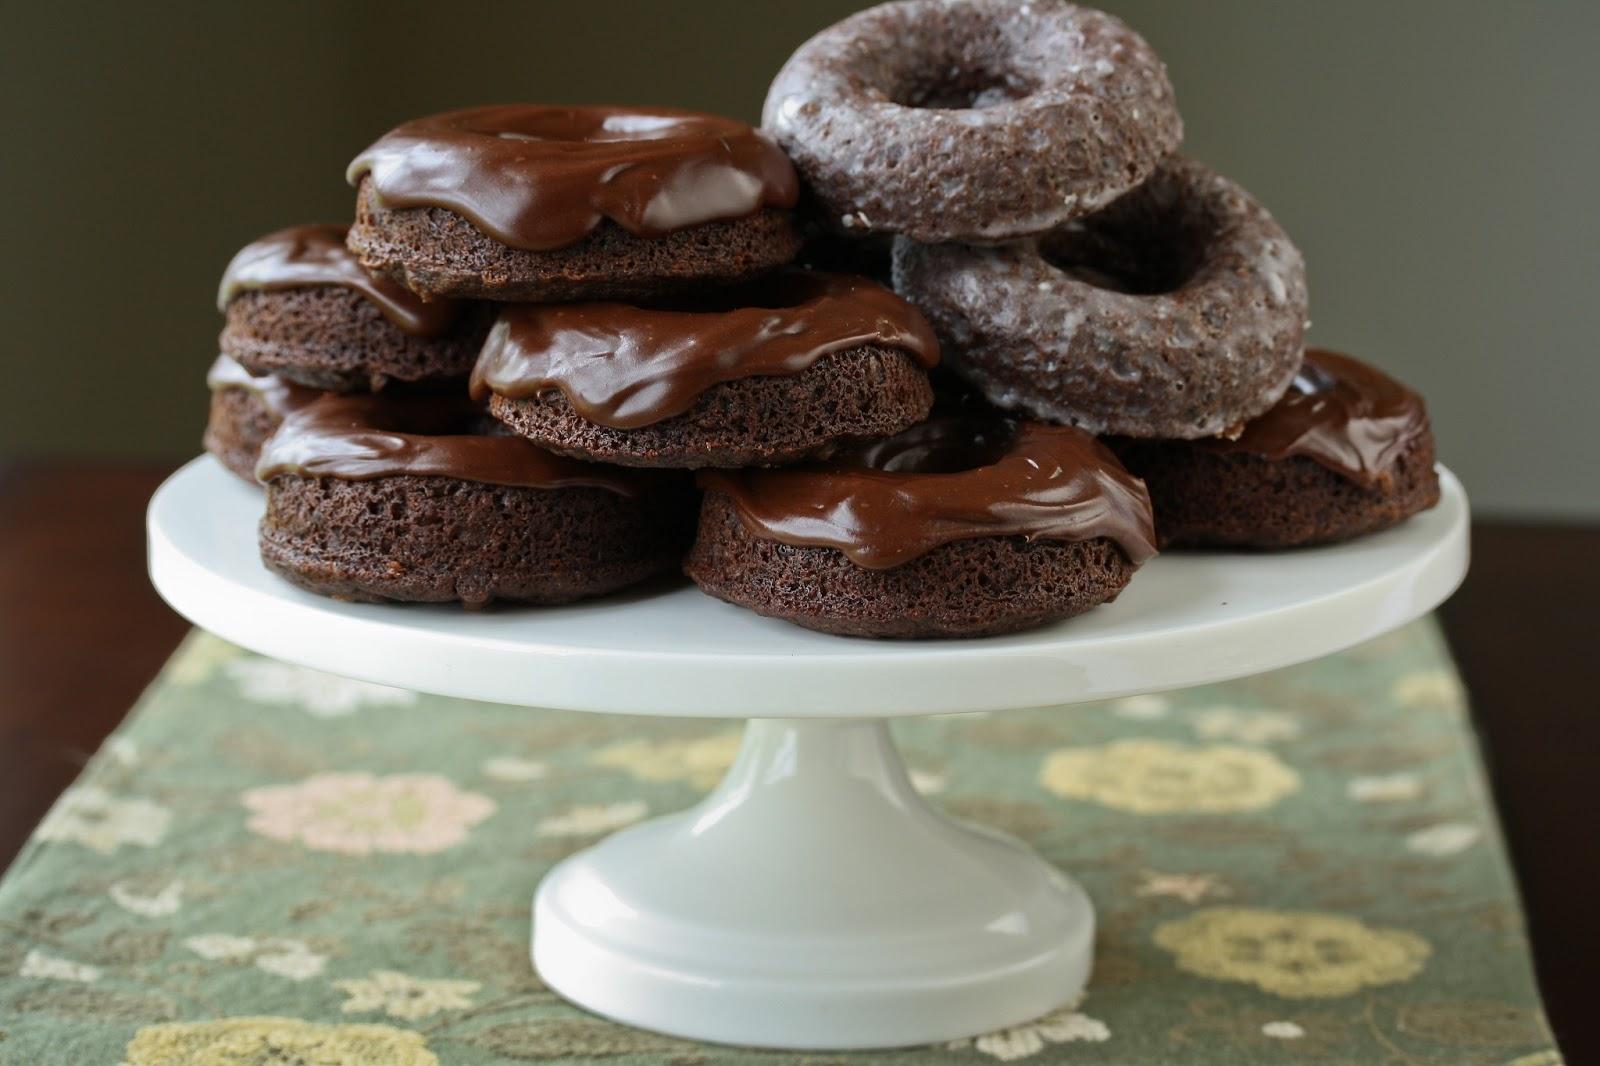 Крофни со чоколаден прелив